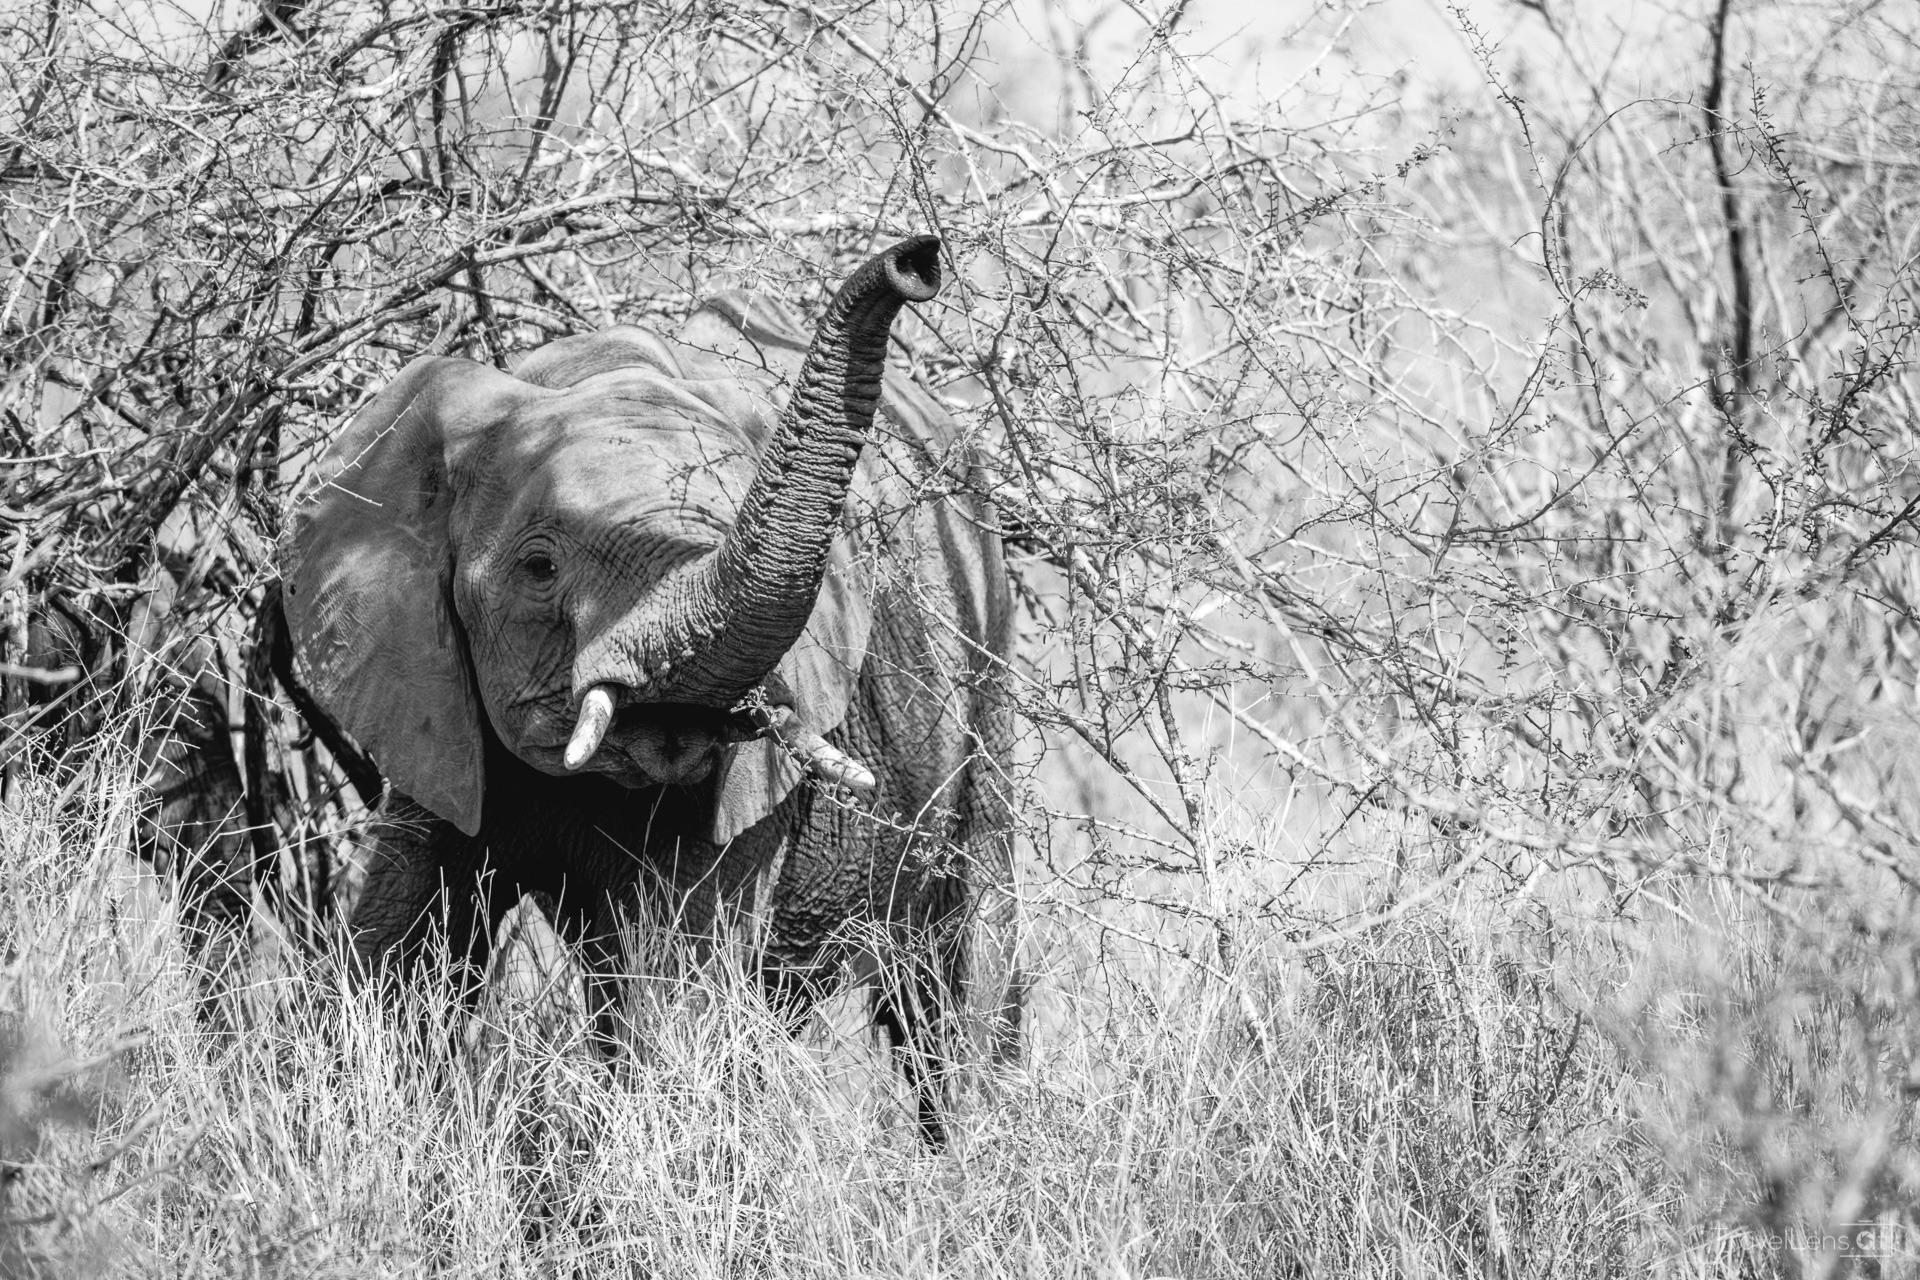 Südafrika Tag 4 – Safari am Weg ins Private Game Reserve (Teil 1)